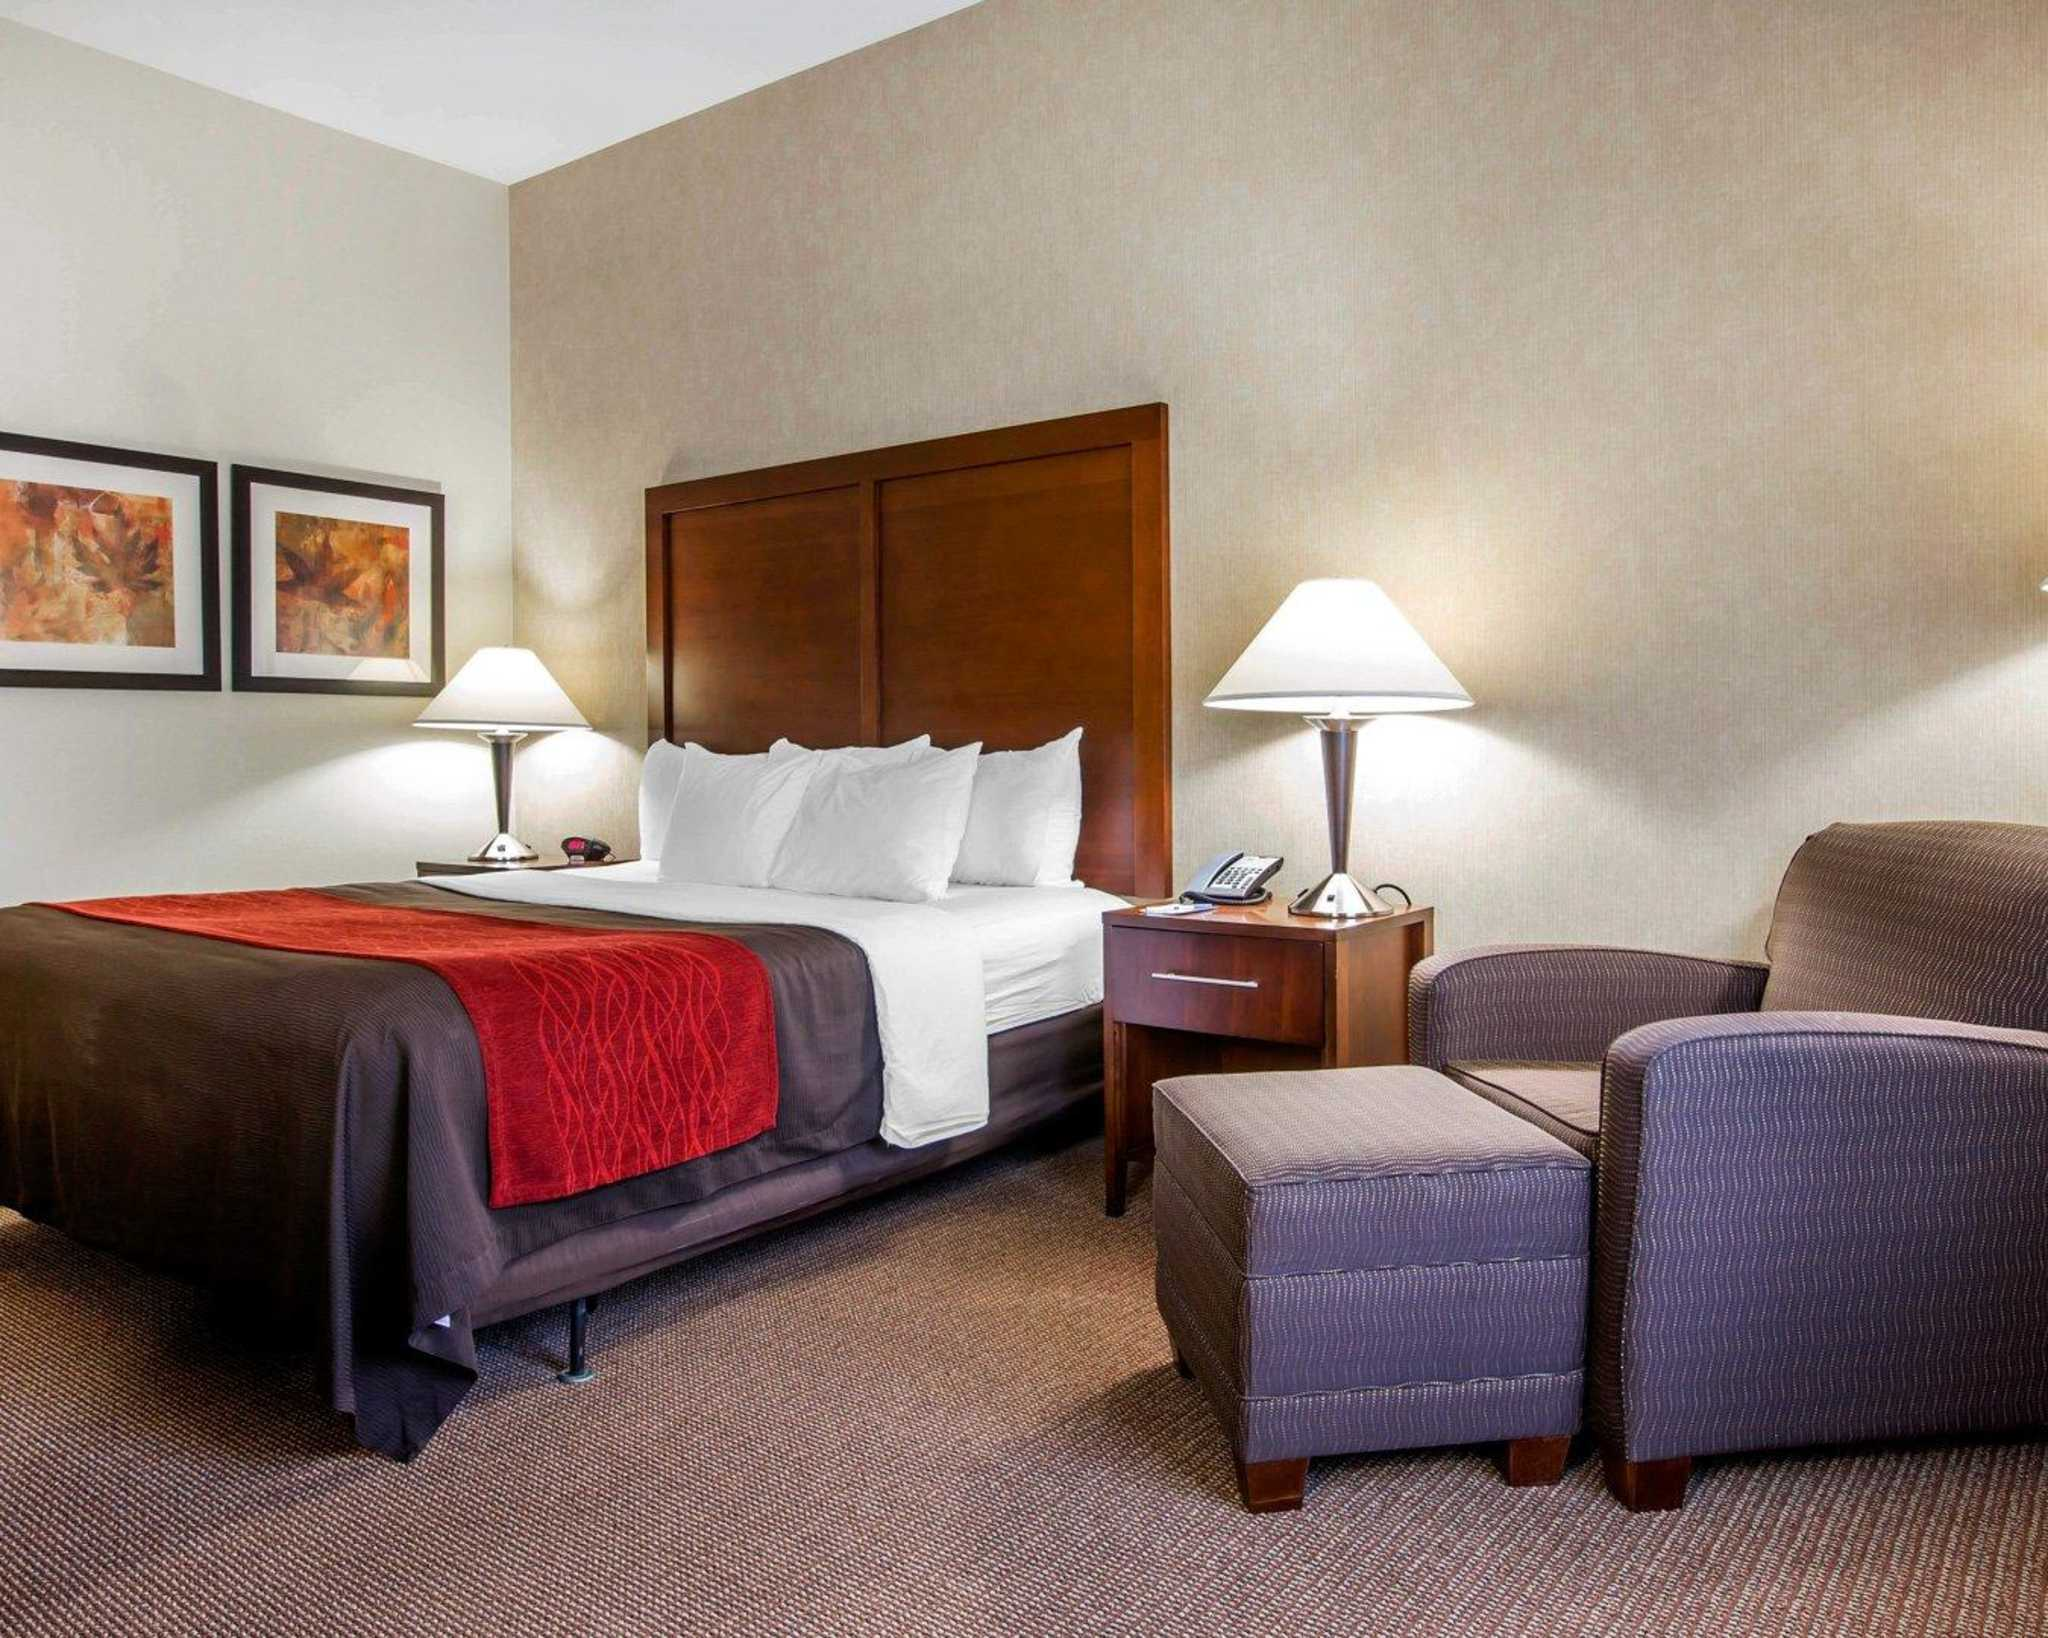 Comfort Inn & Suites adj to Akwesasne Mohawk Casino image 15